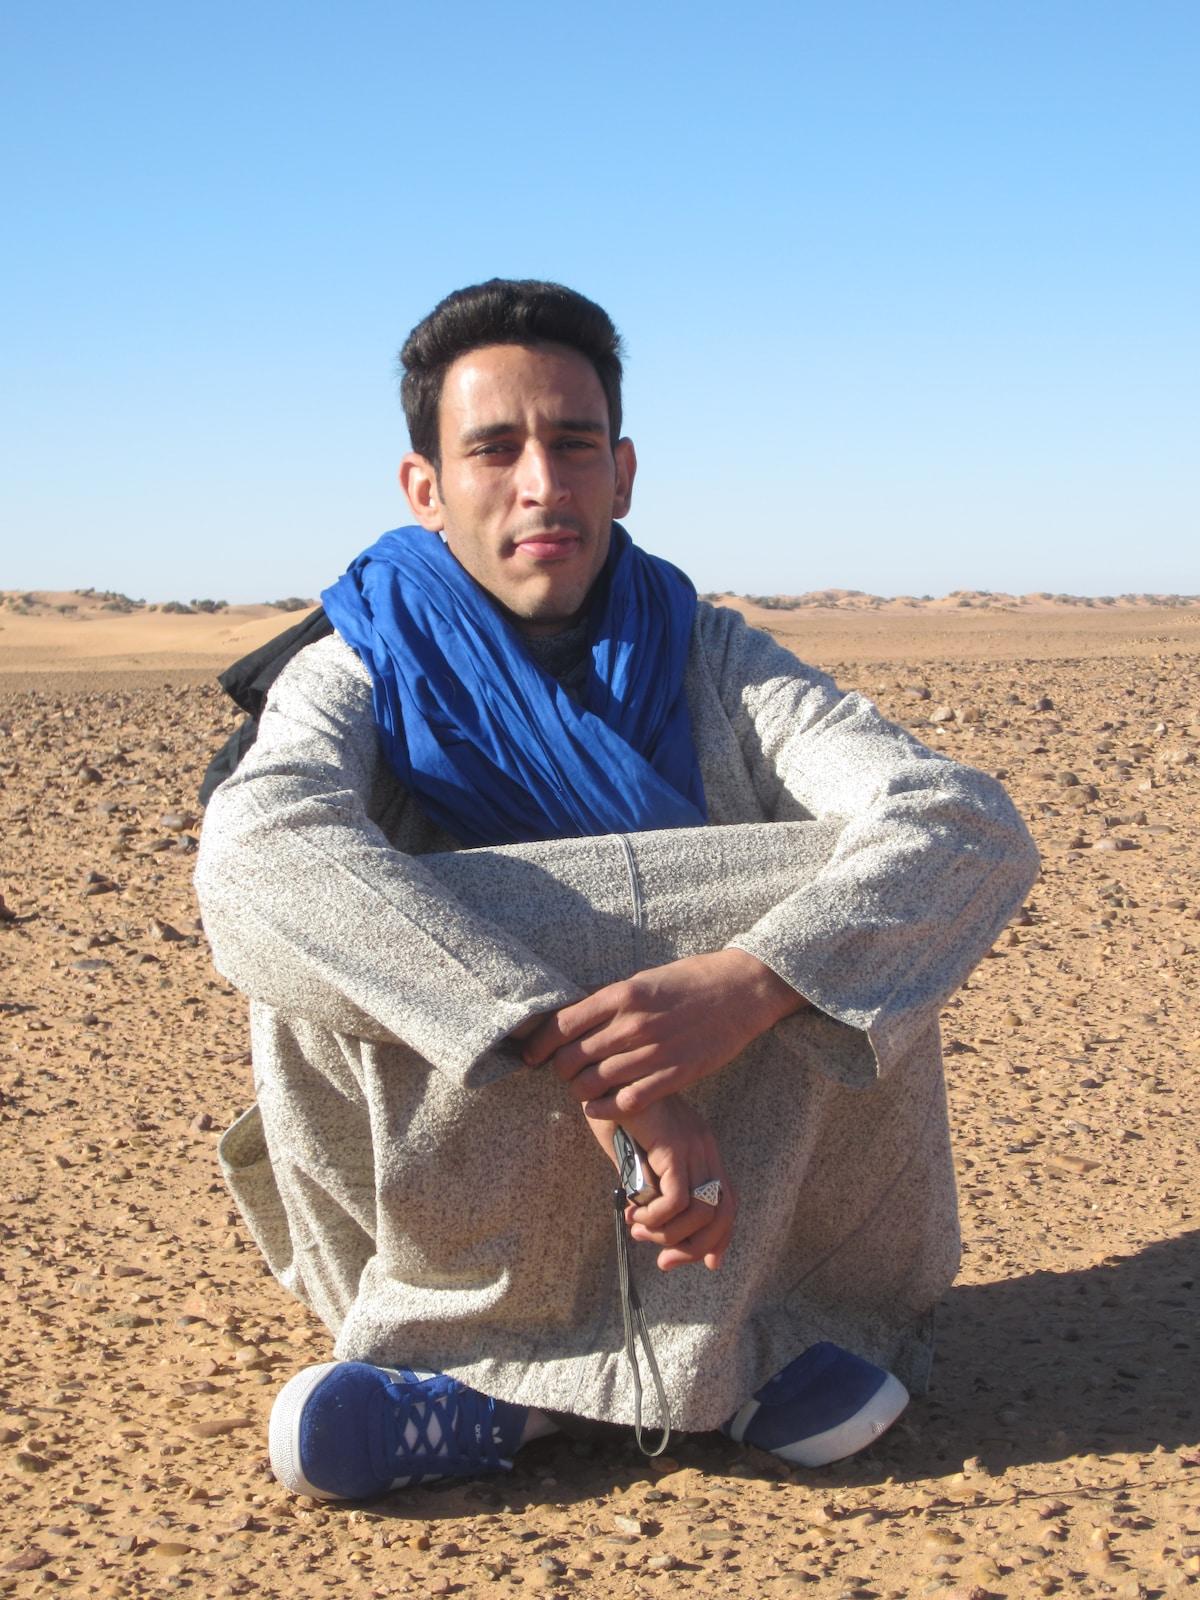 Ismaiyl From Tagounite, Morocco